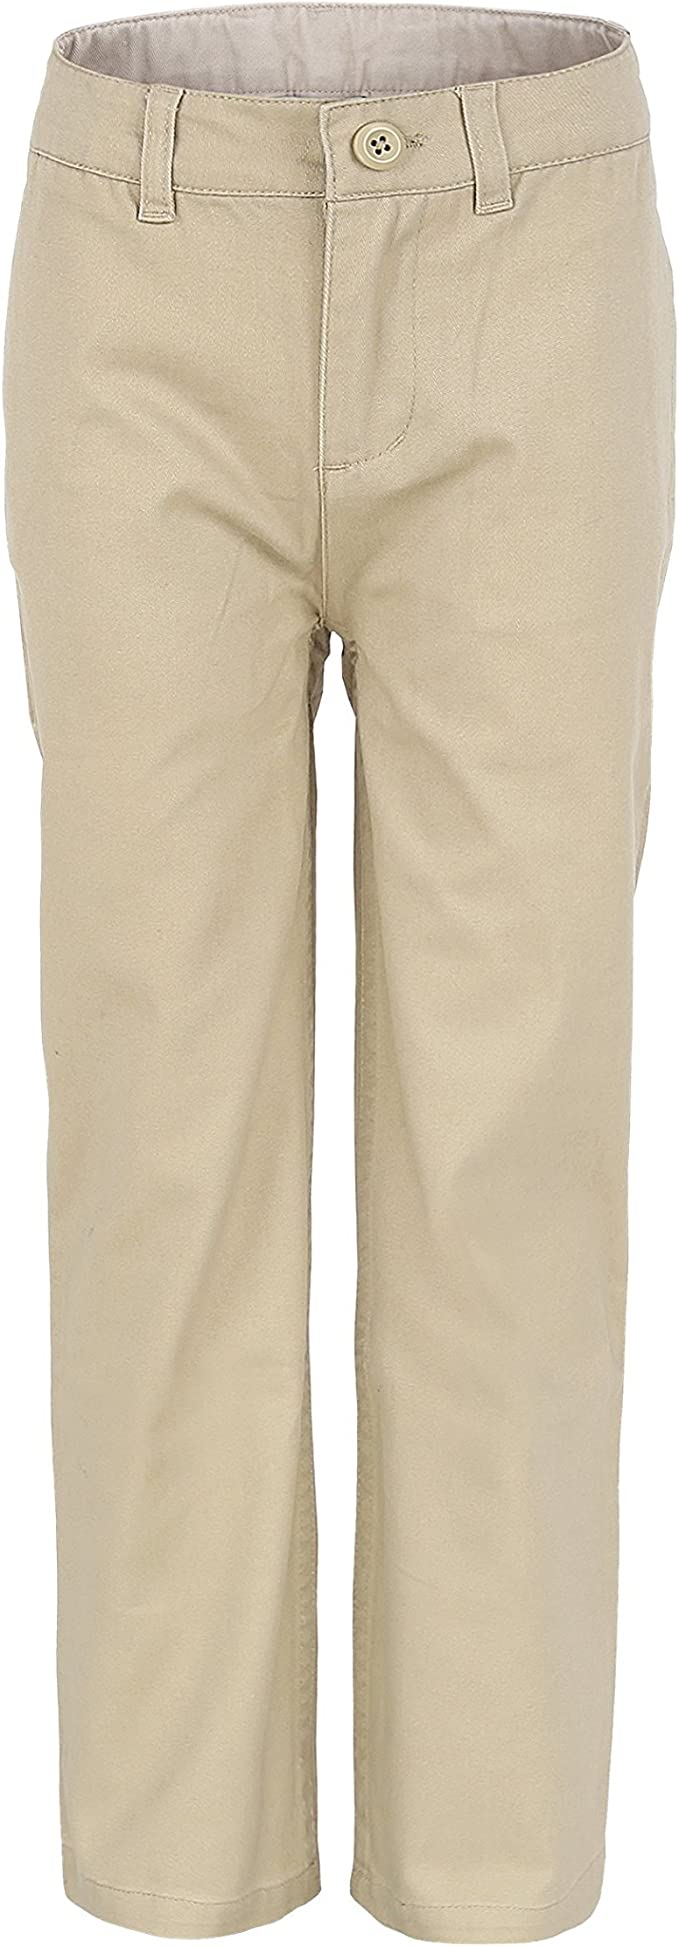 Bienzoe Big Boy/'s School Uniforms Flat Front Adjust Waist Pants